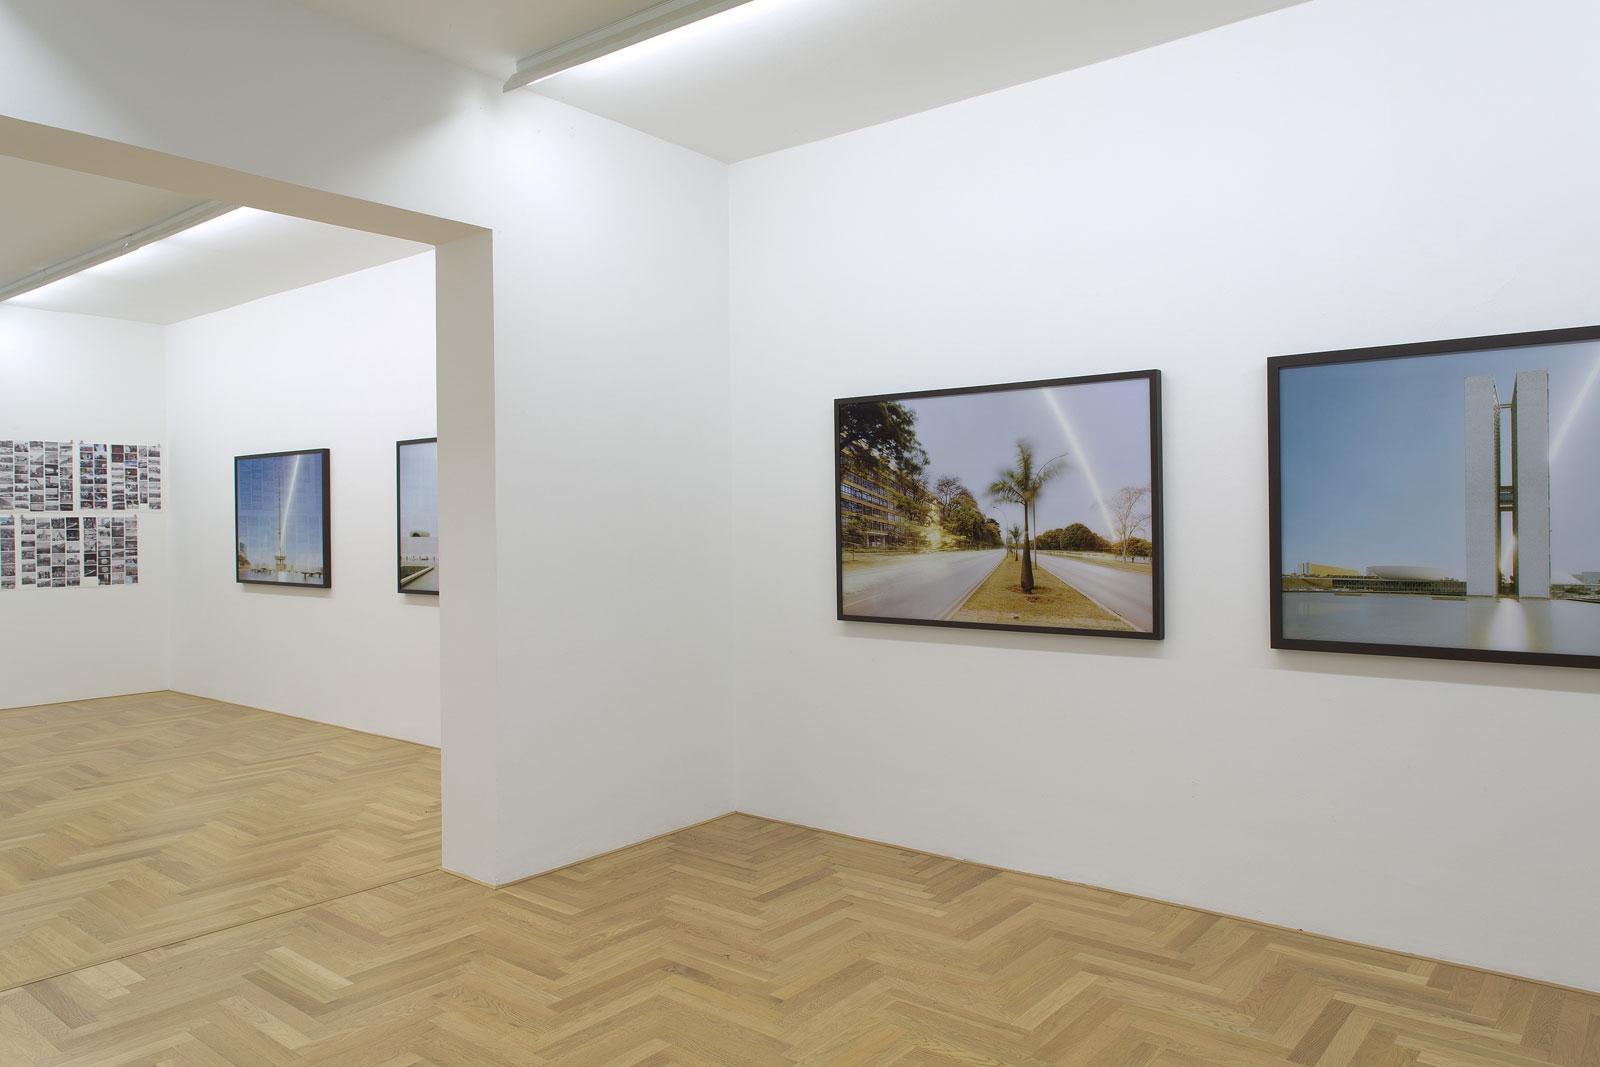 Archiv Utopia, Fahnemann Projekts, Berlin